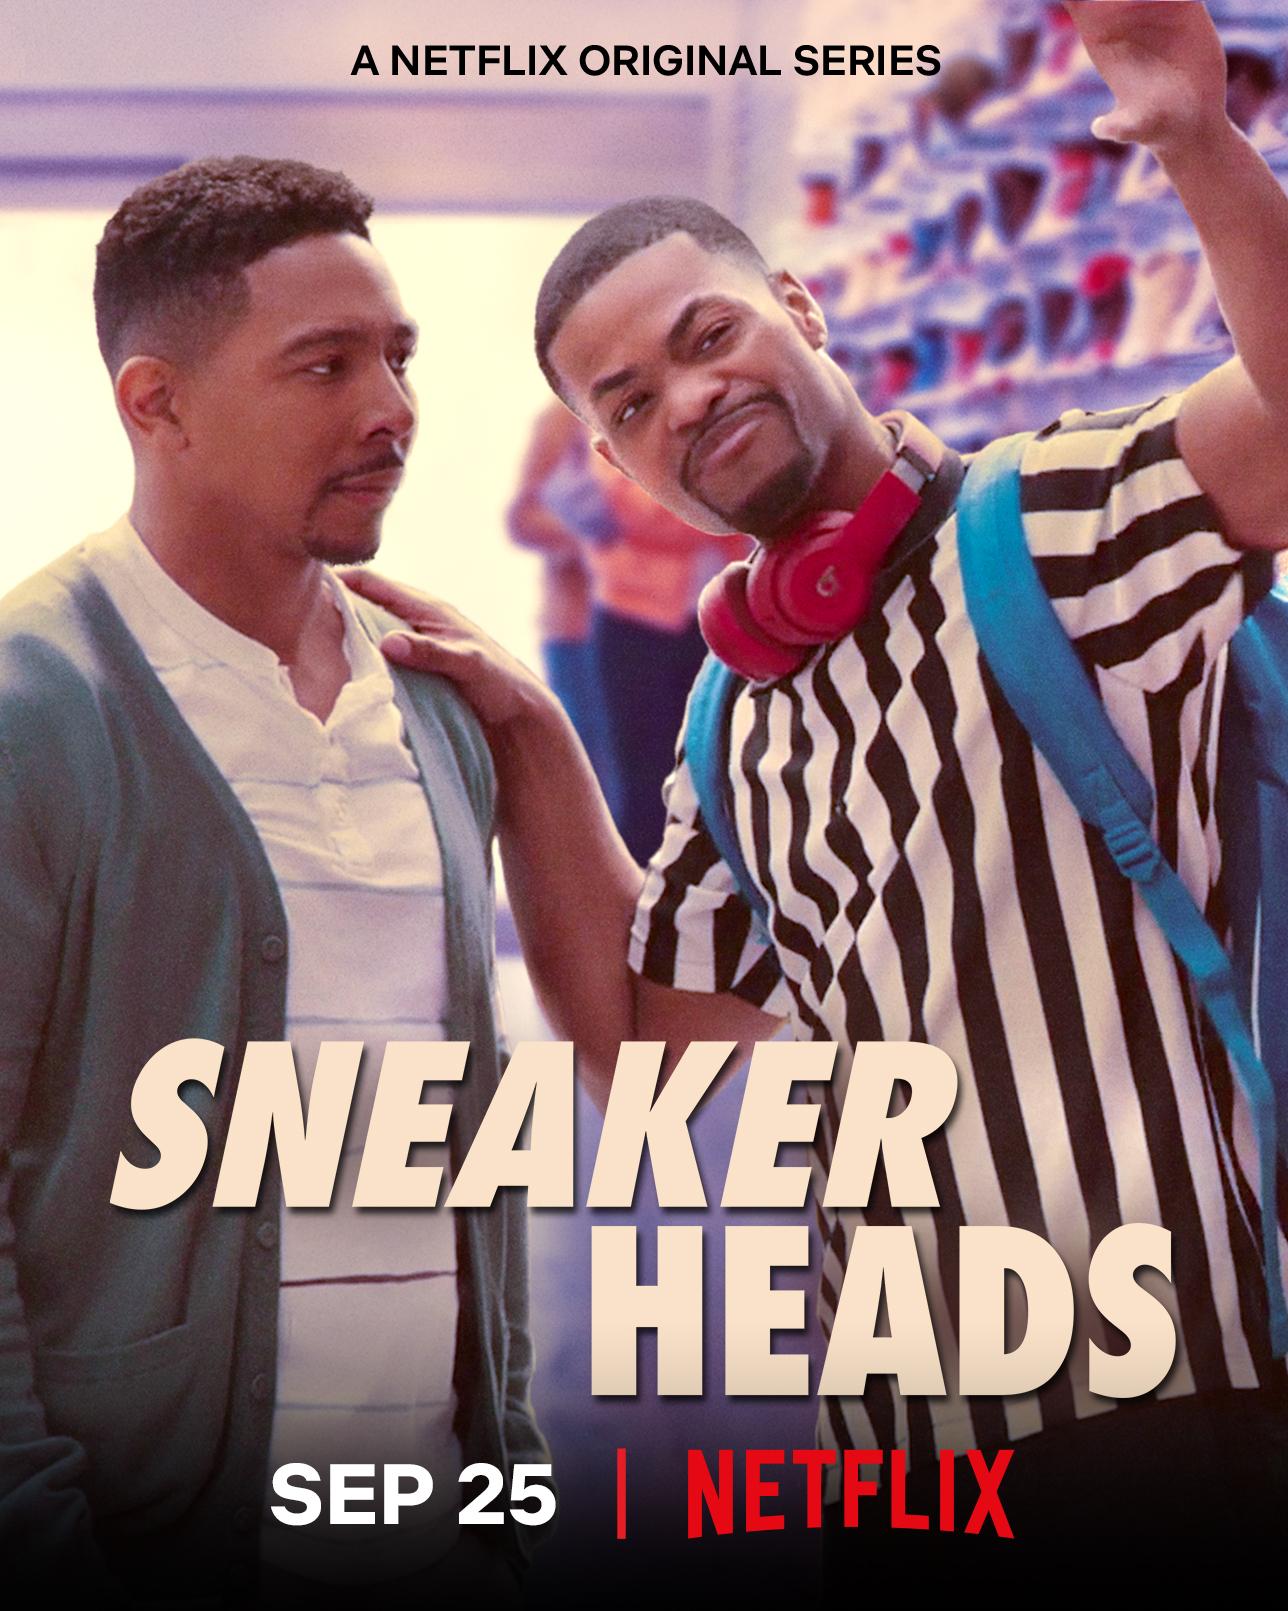 Sneakerheads.S01E05.1080p.WEB.H264-VIDEOHOLE